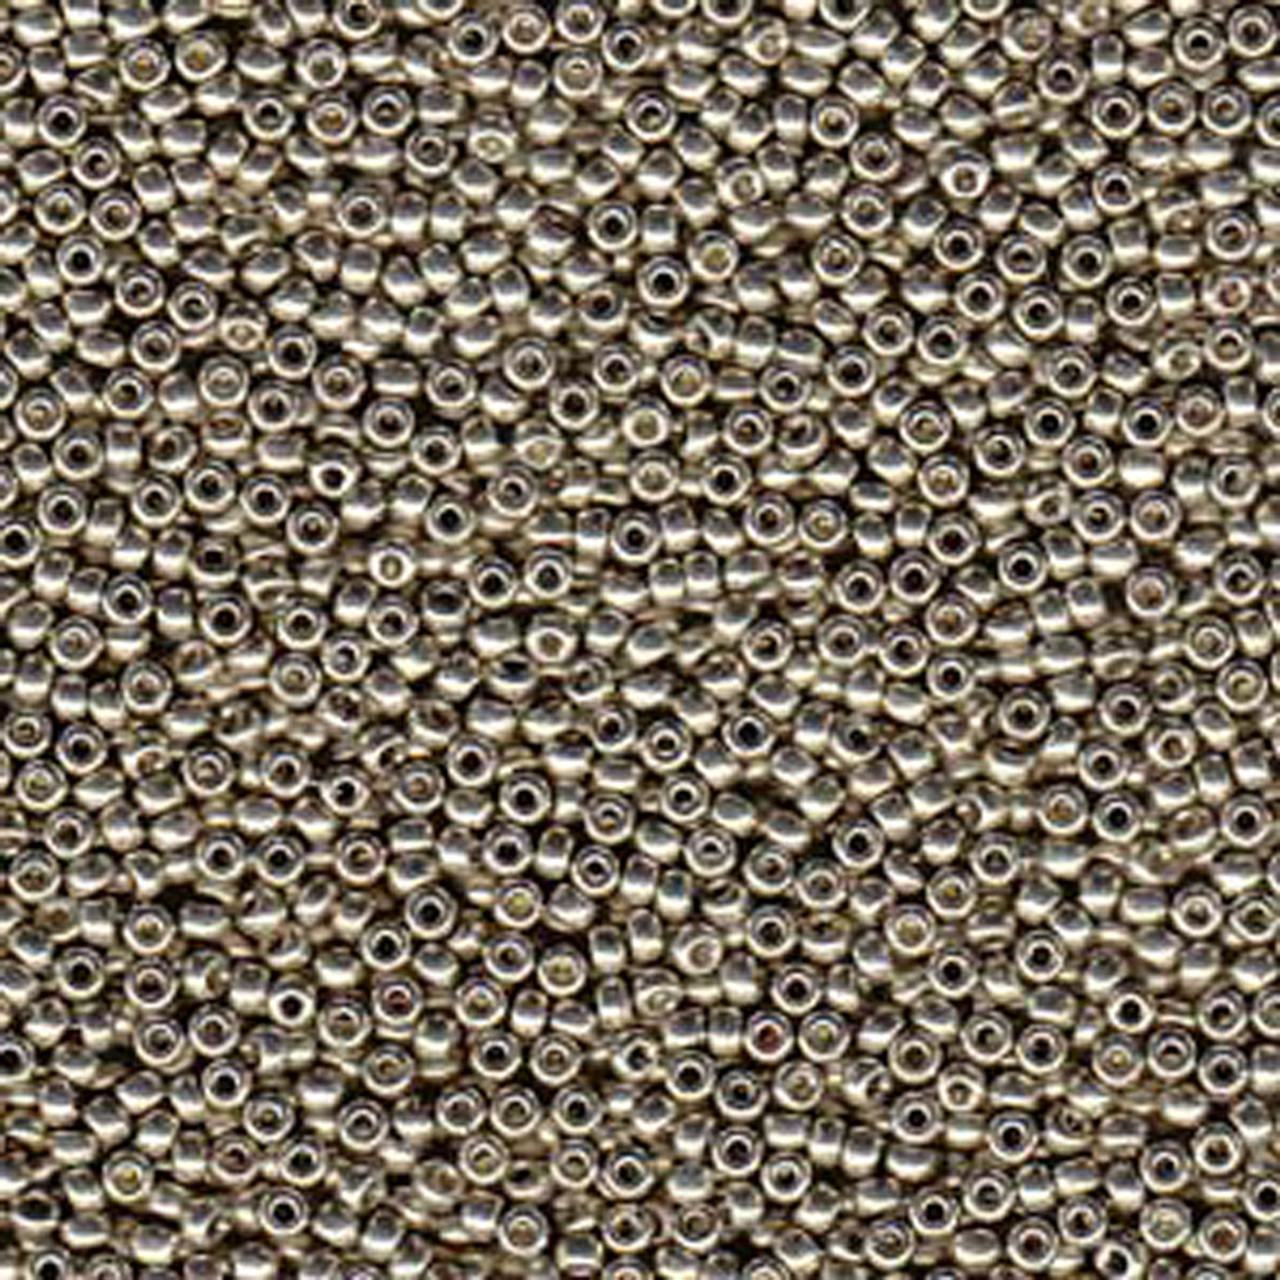 duracoat galvanized light smokey pewter miyuki 11 0 rocailles glass seed beads 24 grams [ 1000 x 1000 Pixel ]